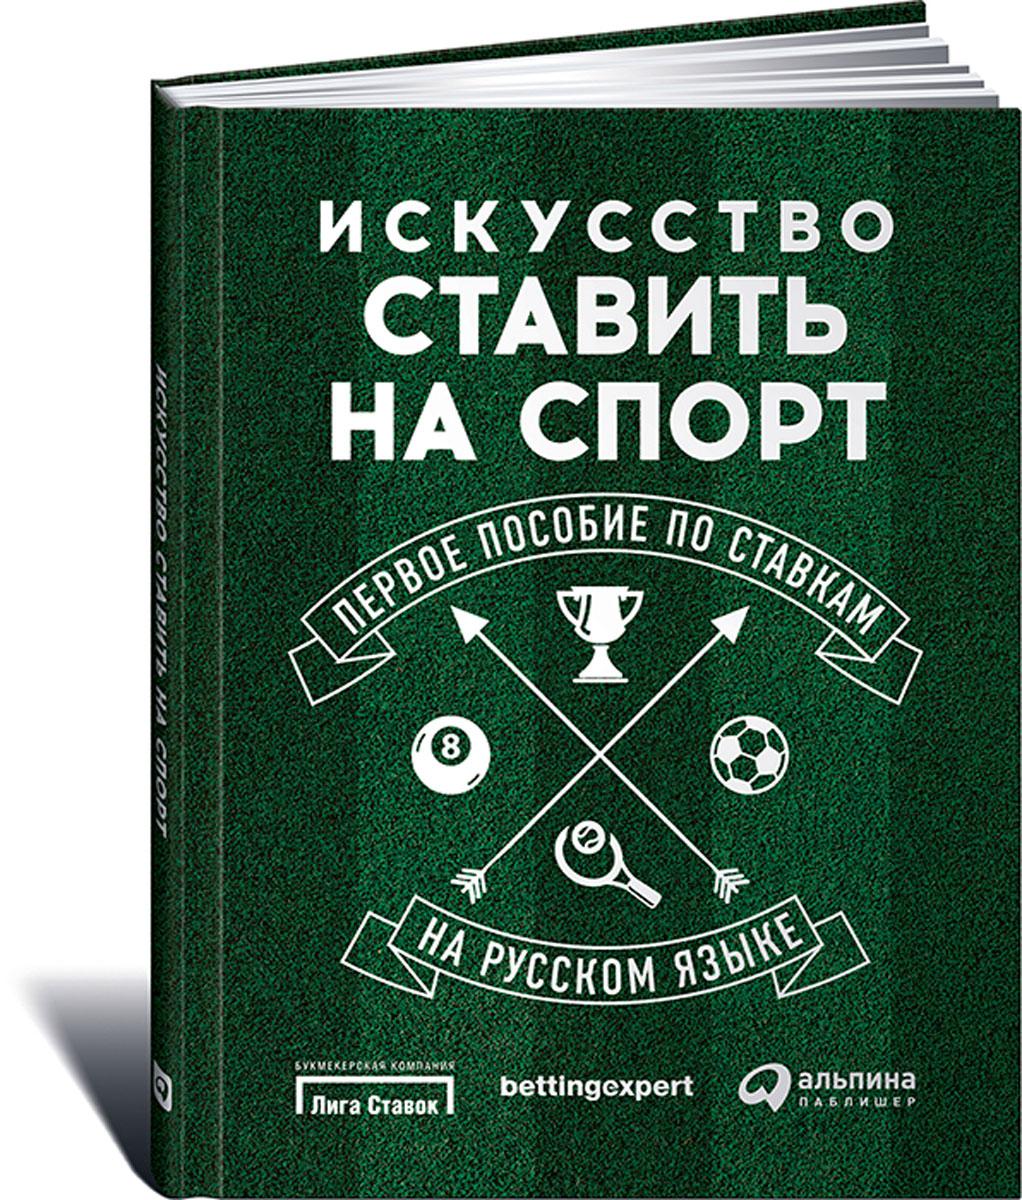 Стивен Харрис «Искусство ставить на спорт»